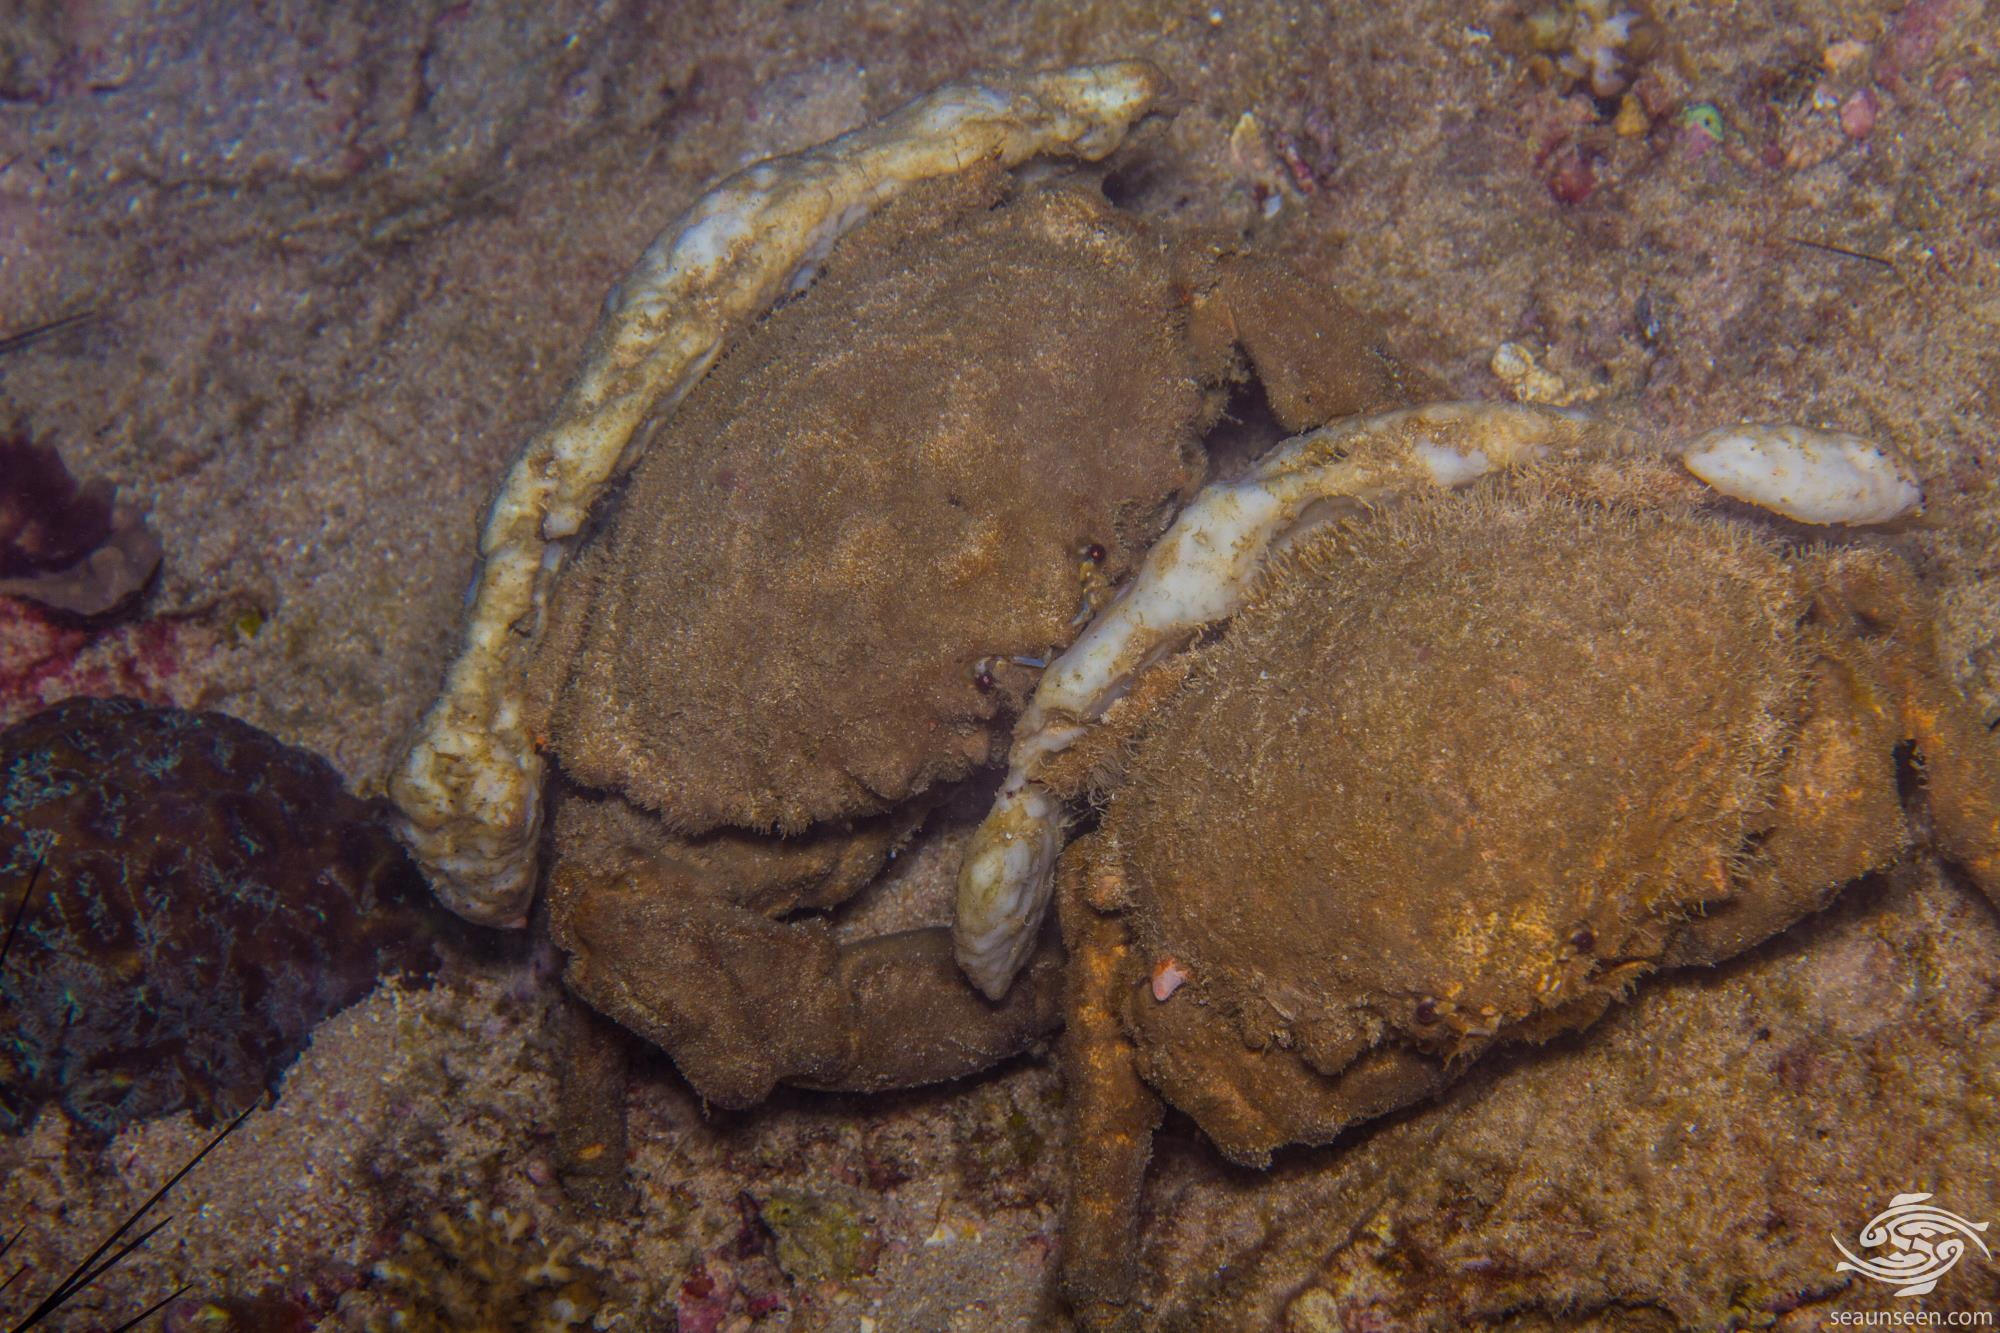 Sponge crab Lauridromia dehaani